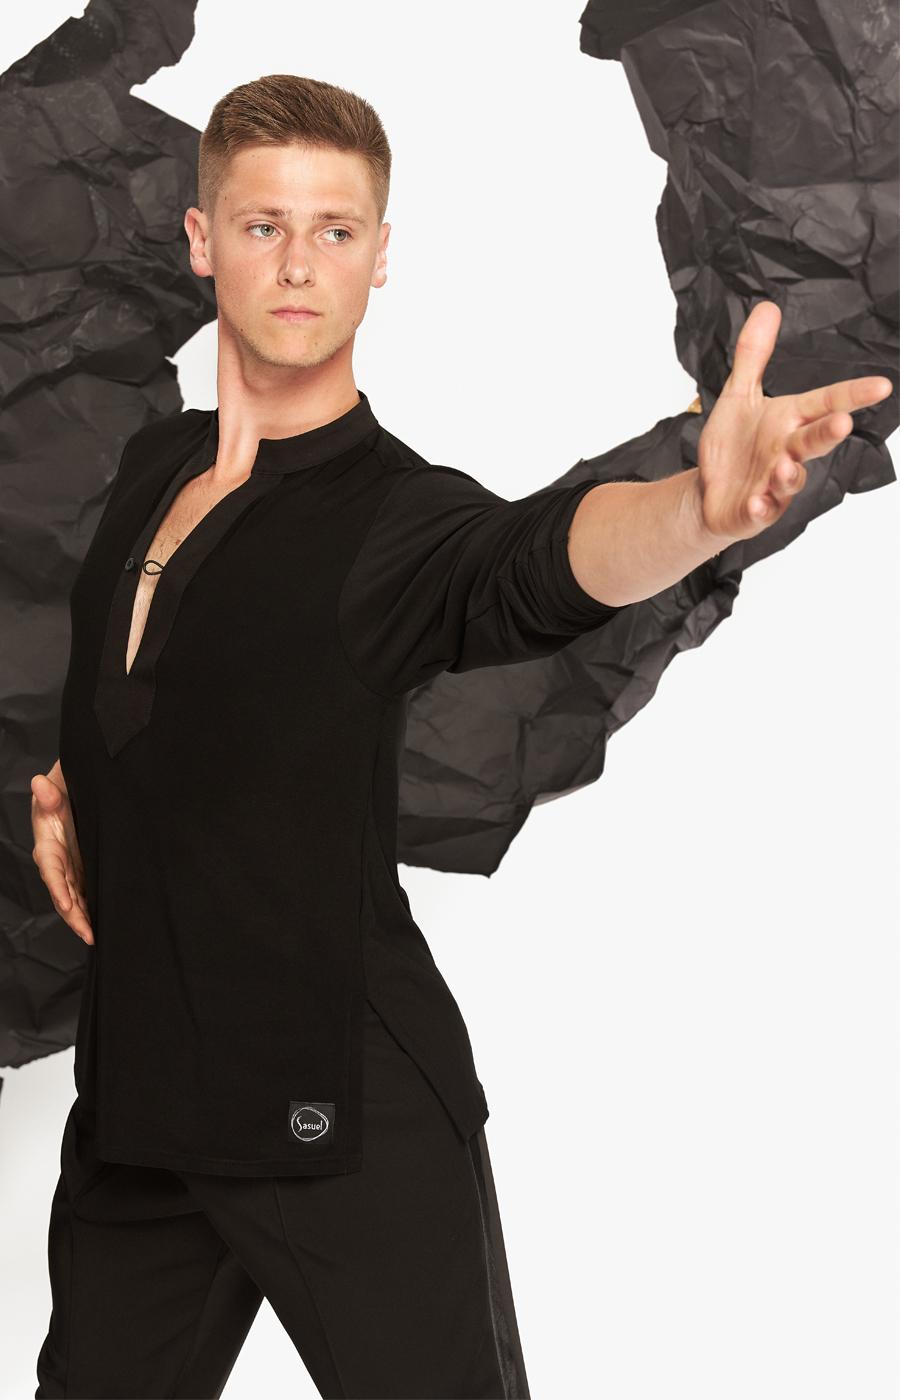 Latin practice shirt Liam